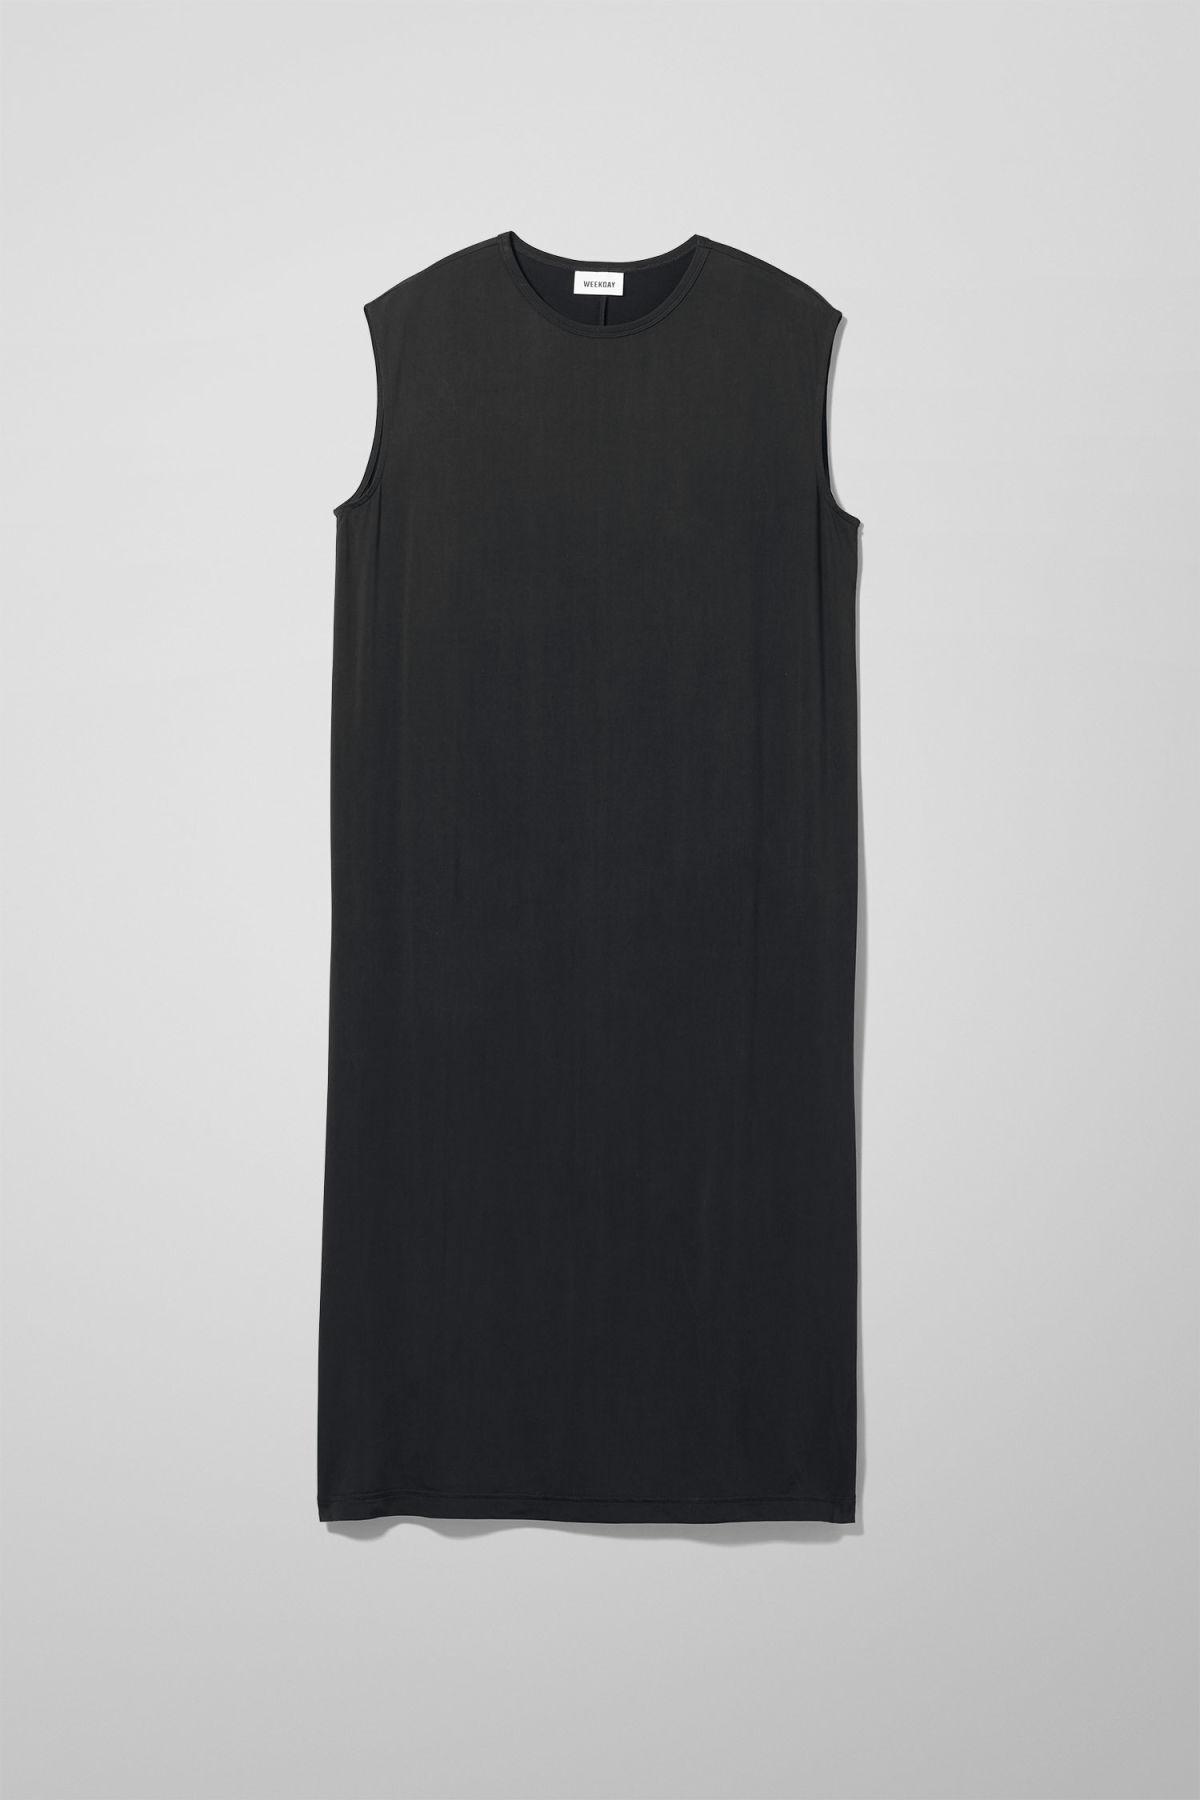 Image of Casey Dress - Black-XS